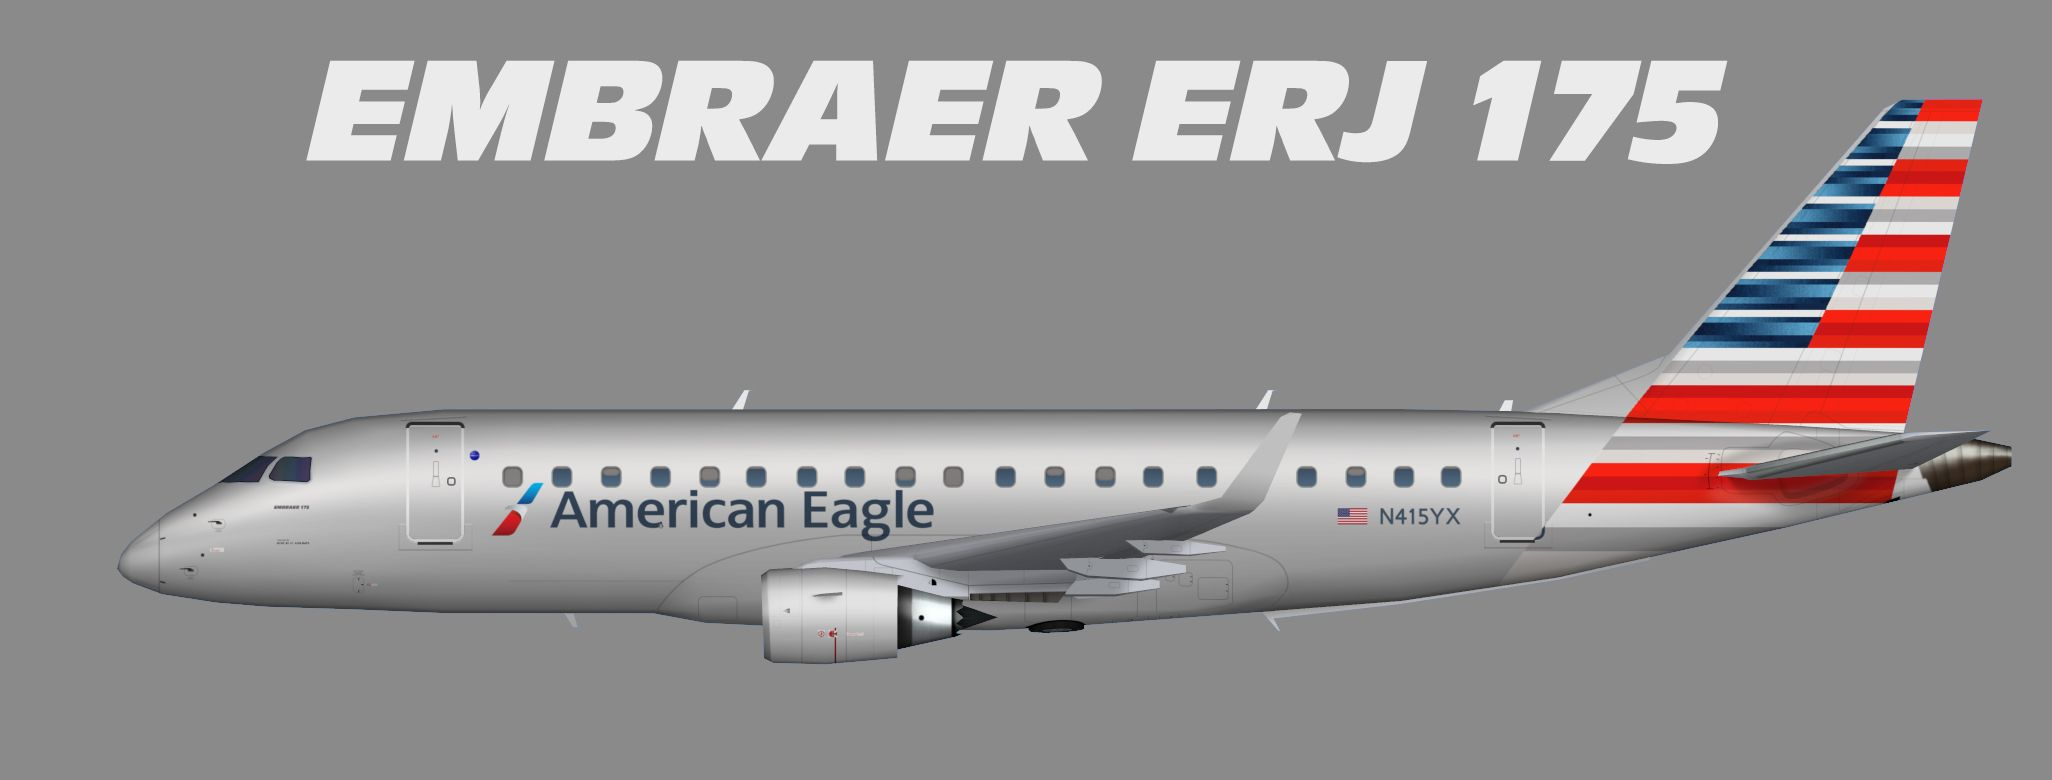 American Eagle Embraer ERJ 175 | ERJ 175 | Aircraft ... - photo#26